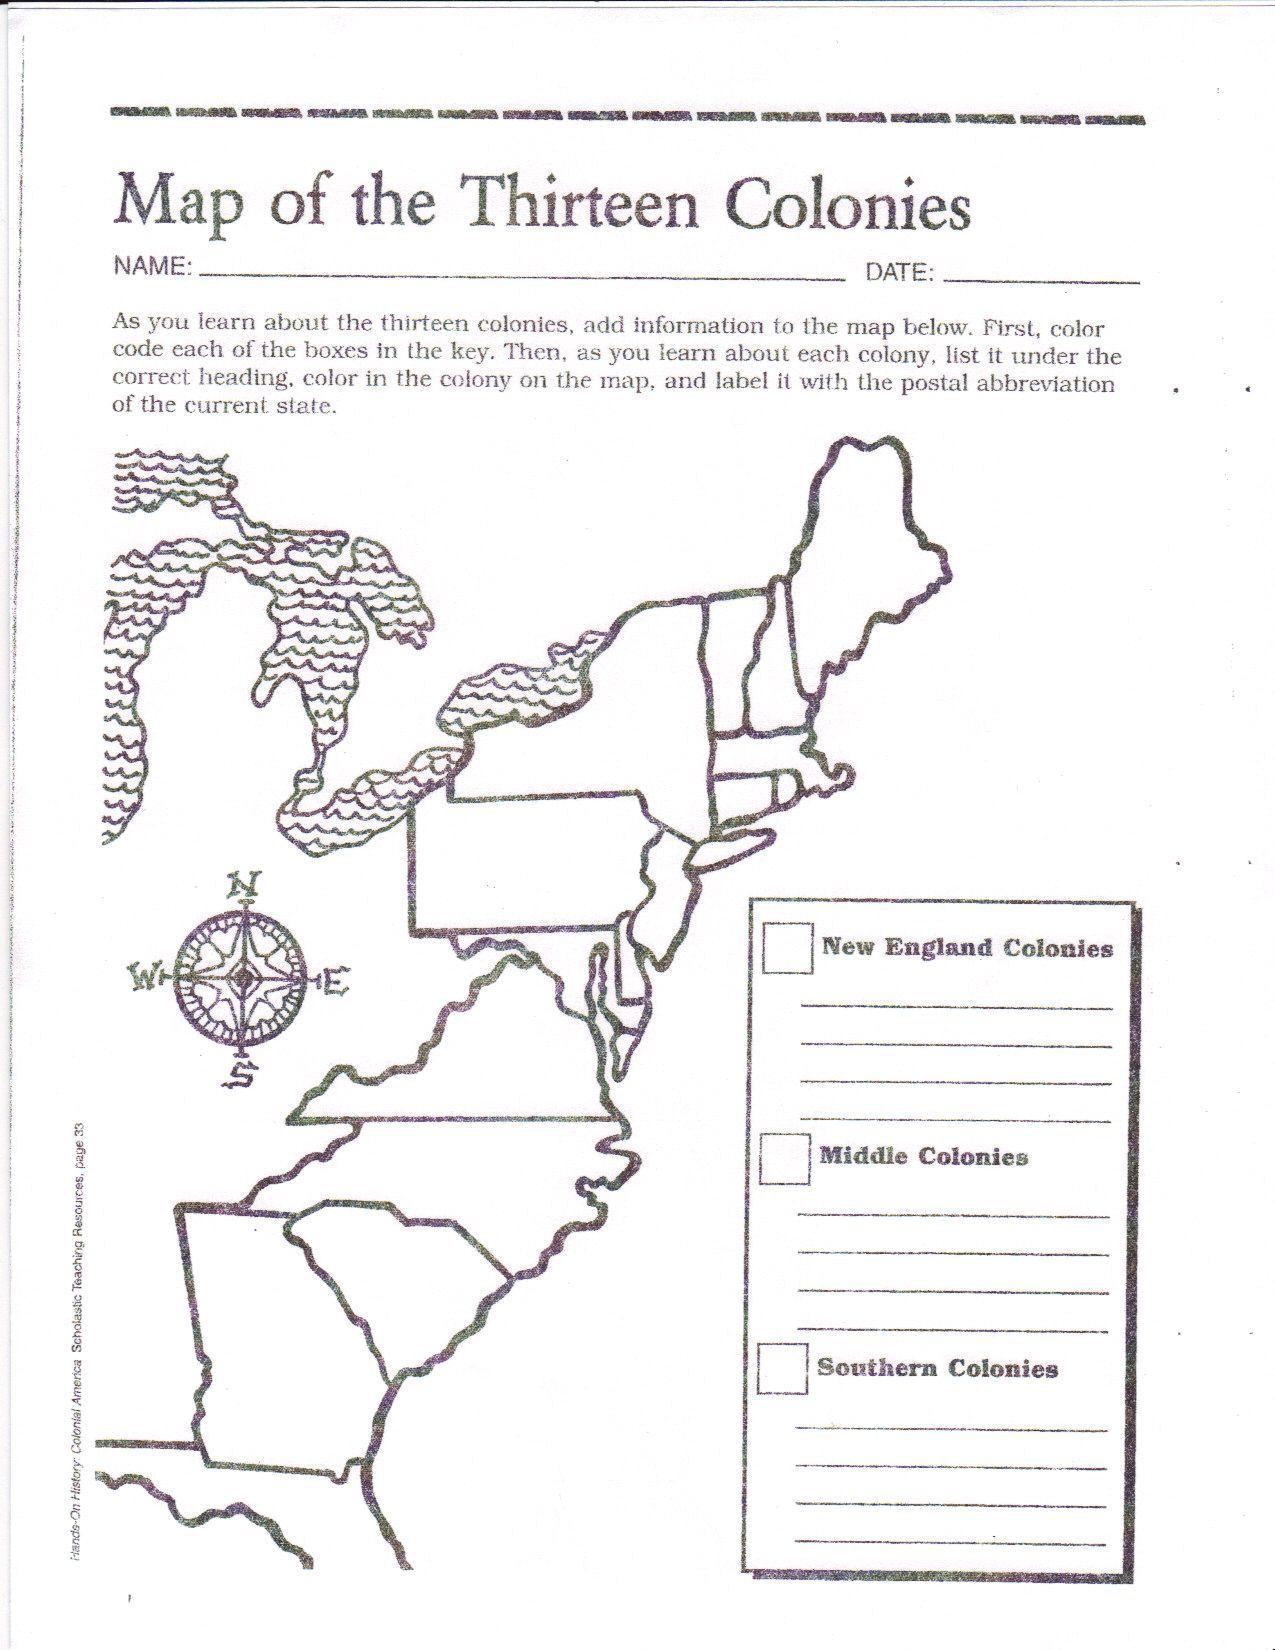 Blank Map Of The 13 Original Colonies Google Search Social Studies Worksheets 13 Colonies Map In 2021 13 Colonies Map Social Studies Worksheets 13 Colonies Activities